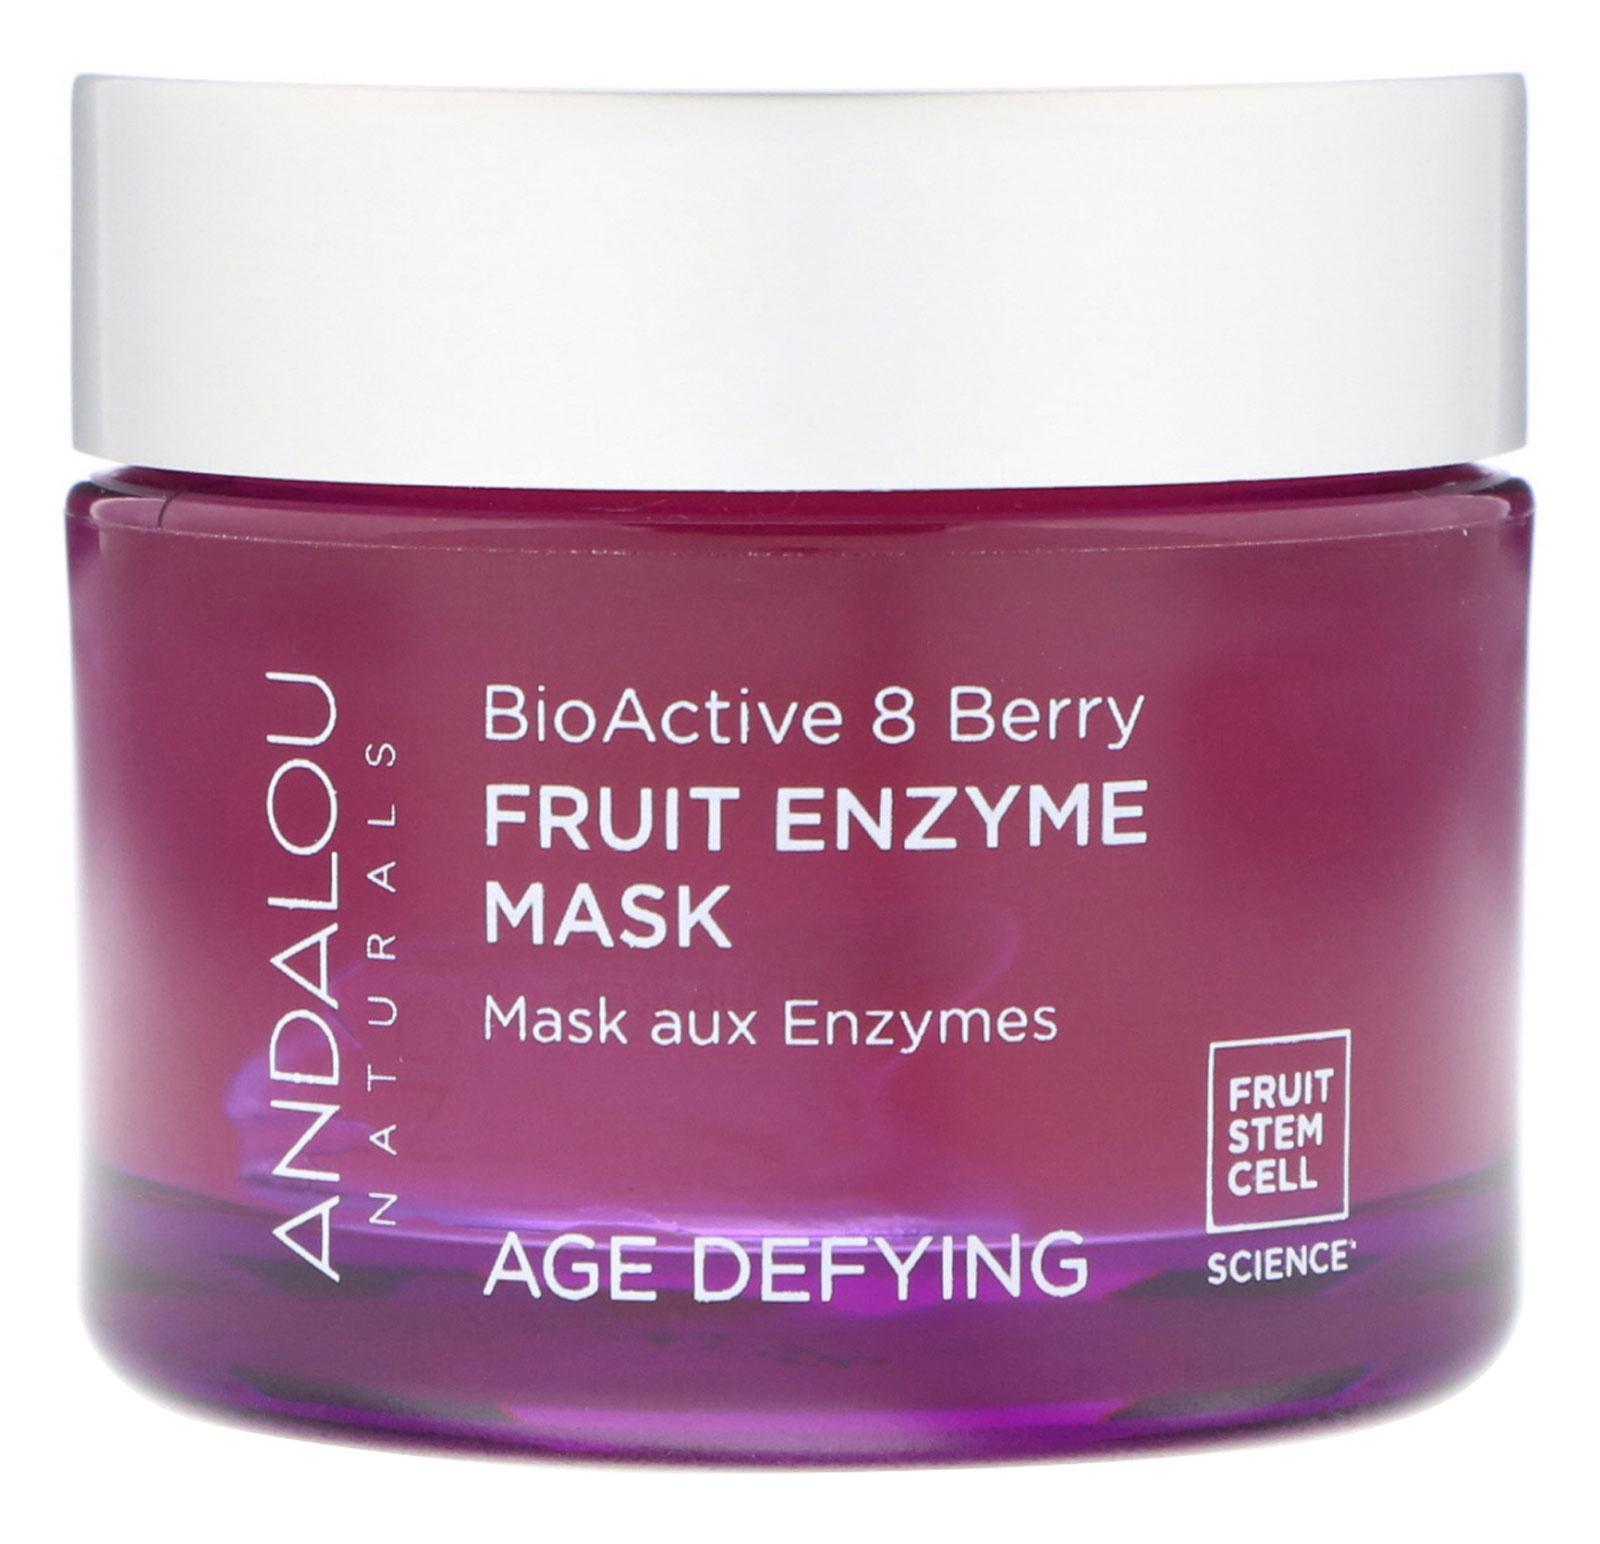 Andalou Bioactive Berry Fruit Enzyme Mask